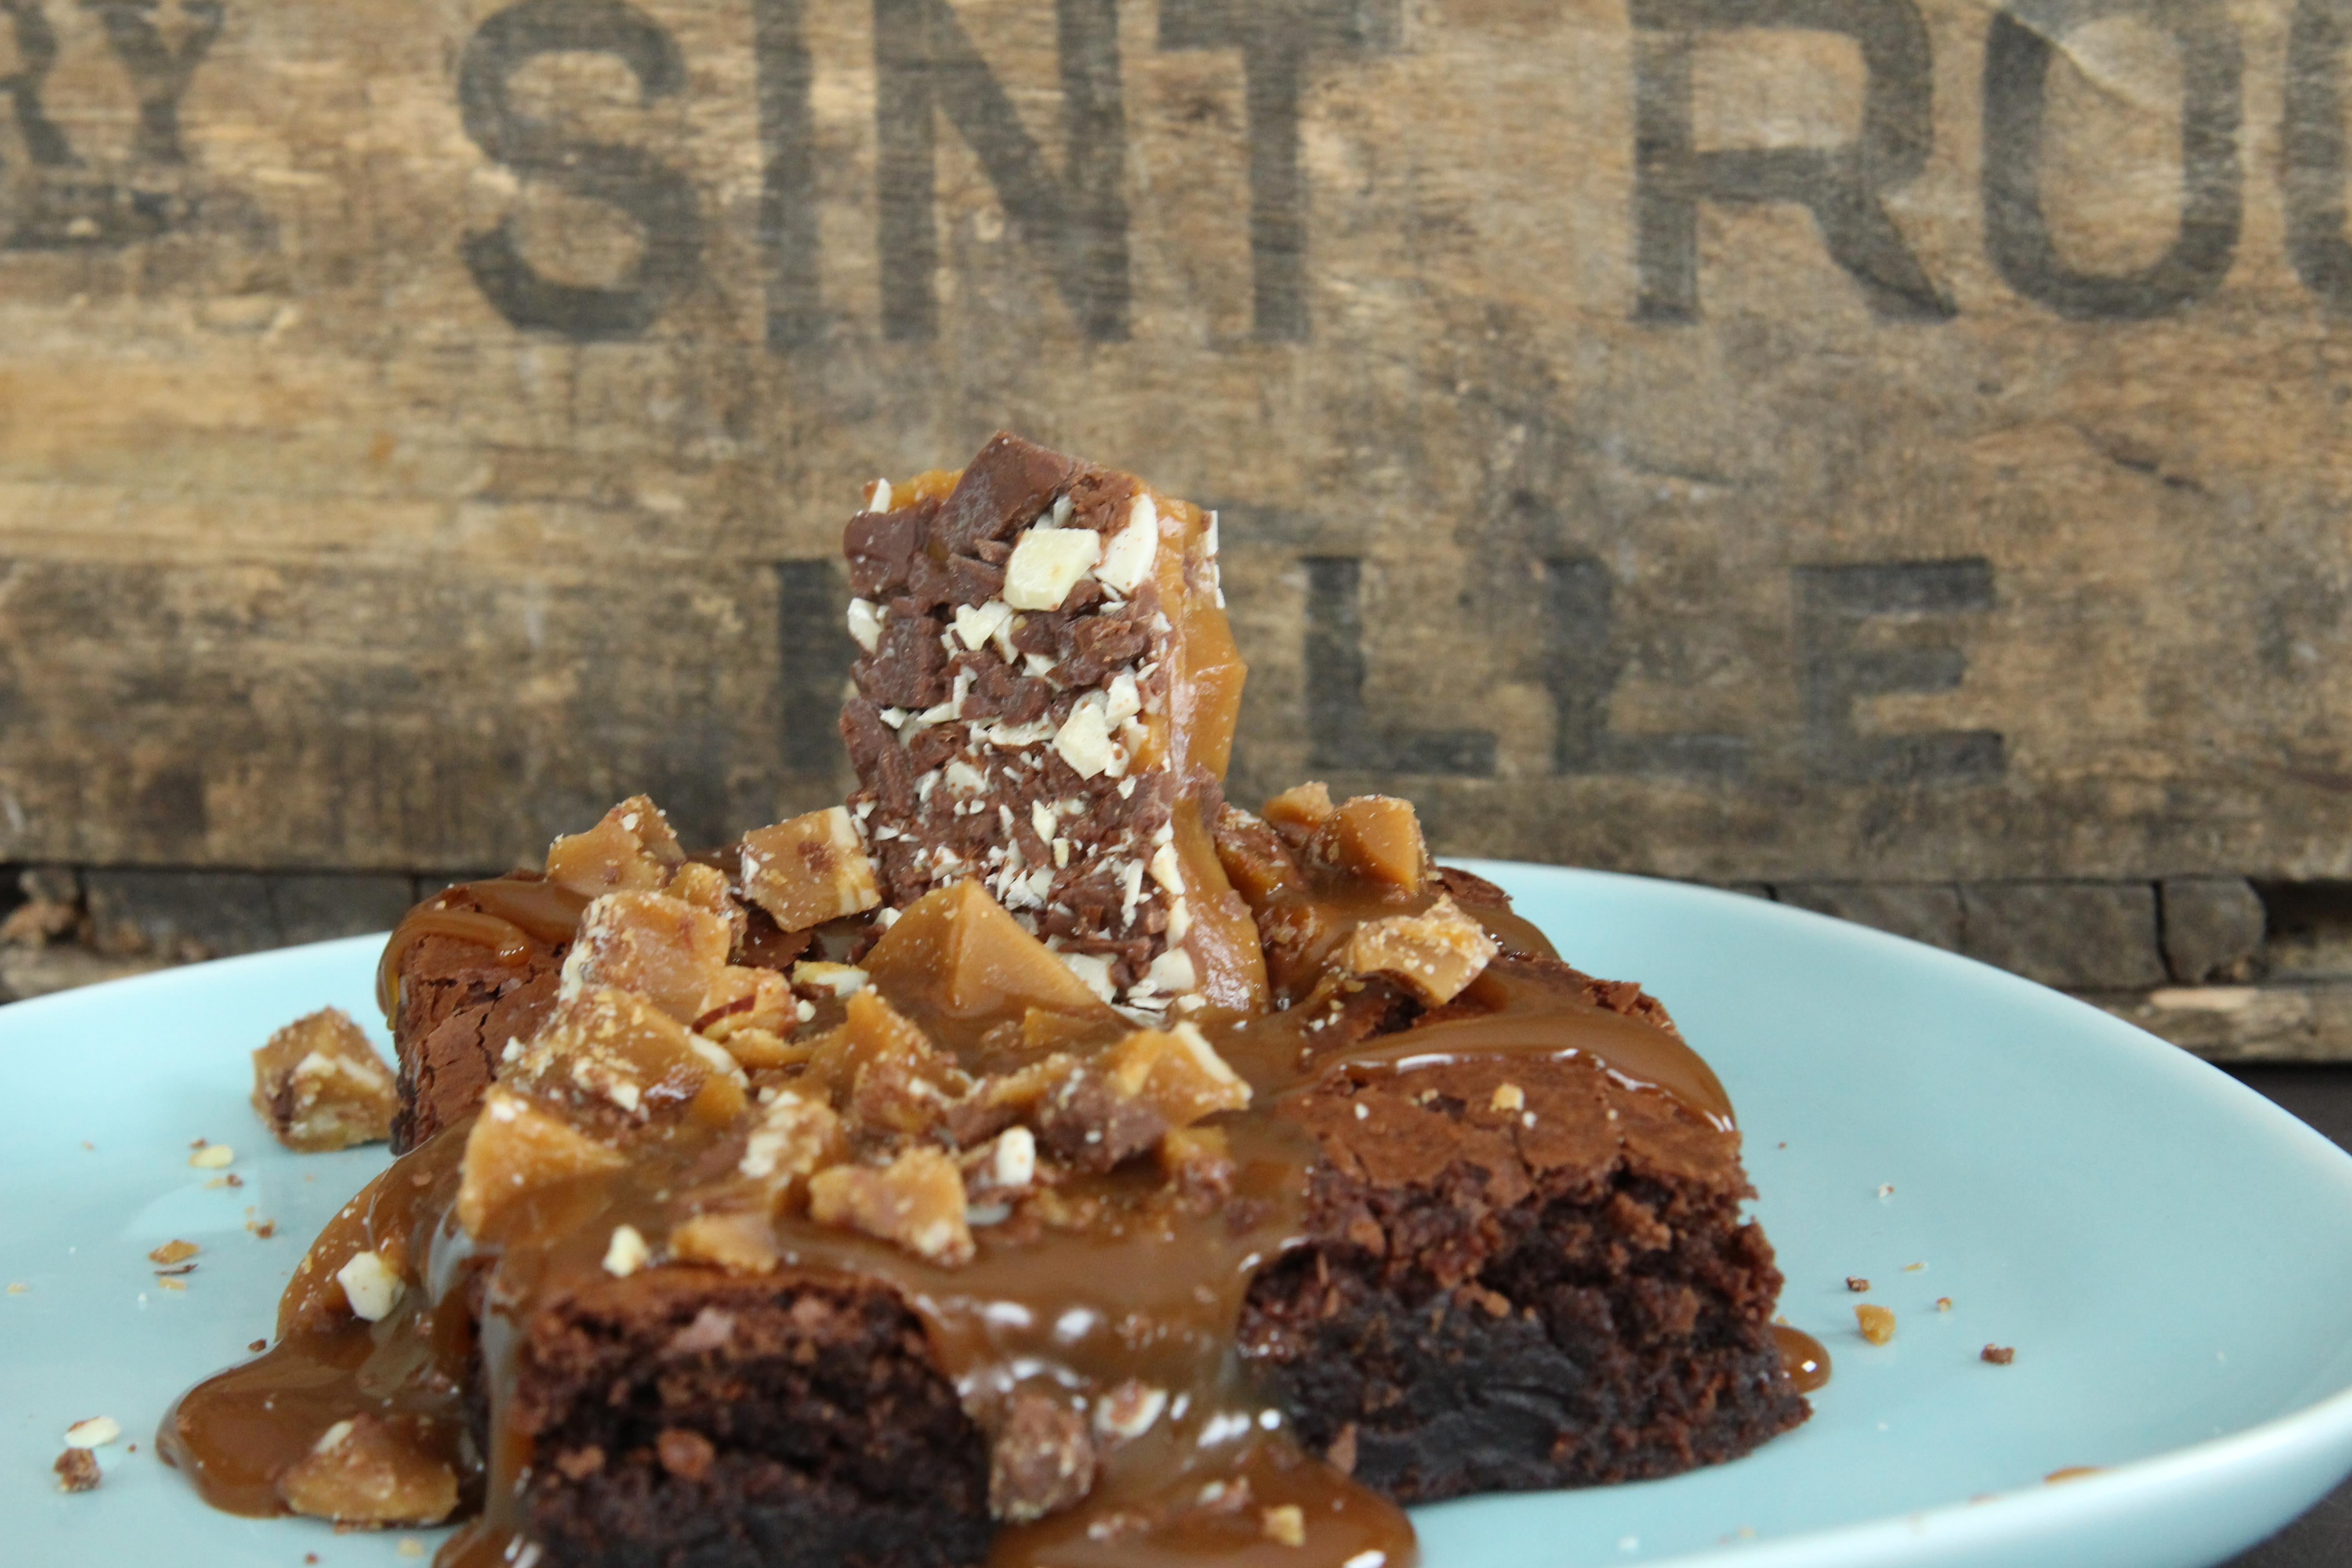 Fudge brownie w/almond toffee crunch